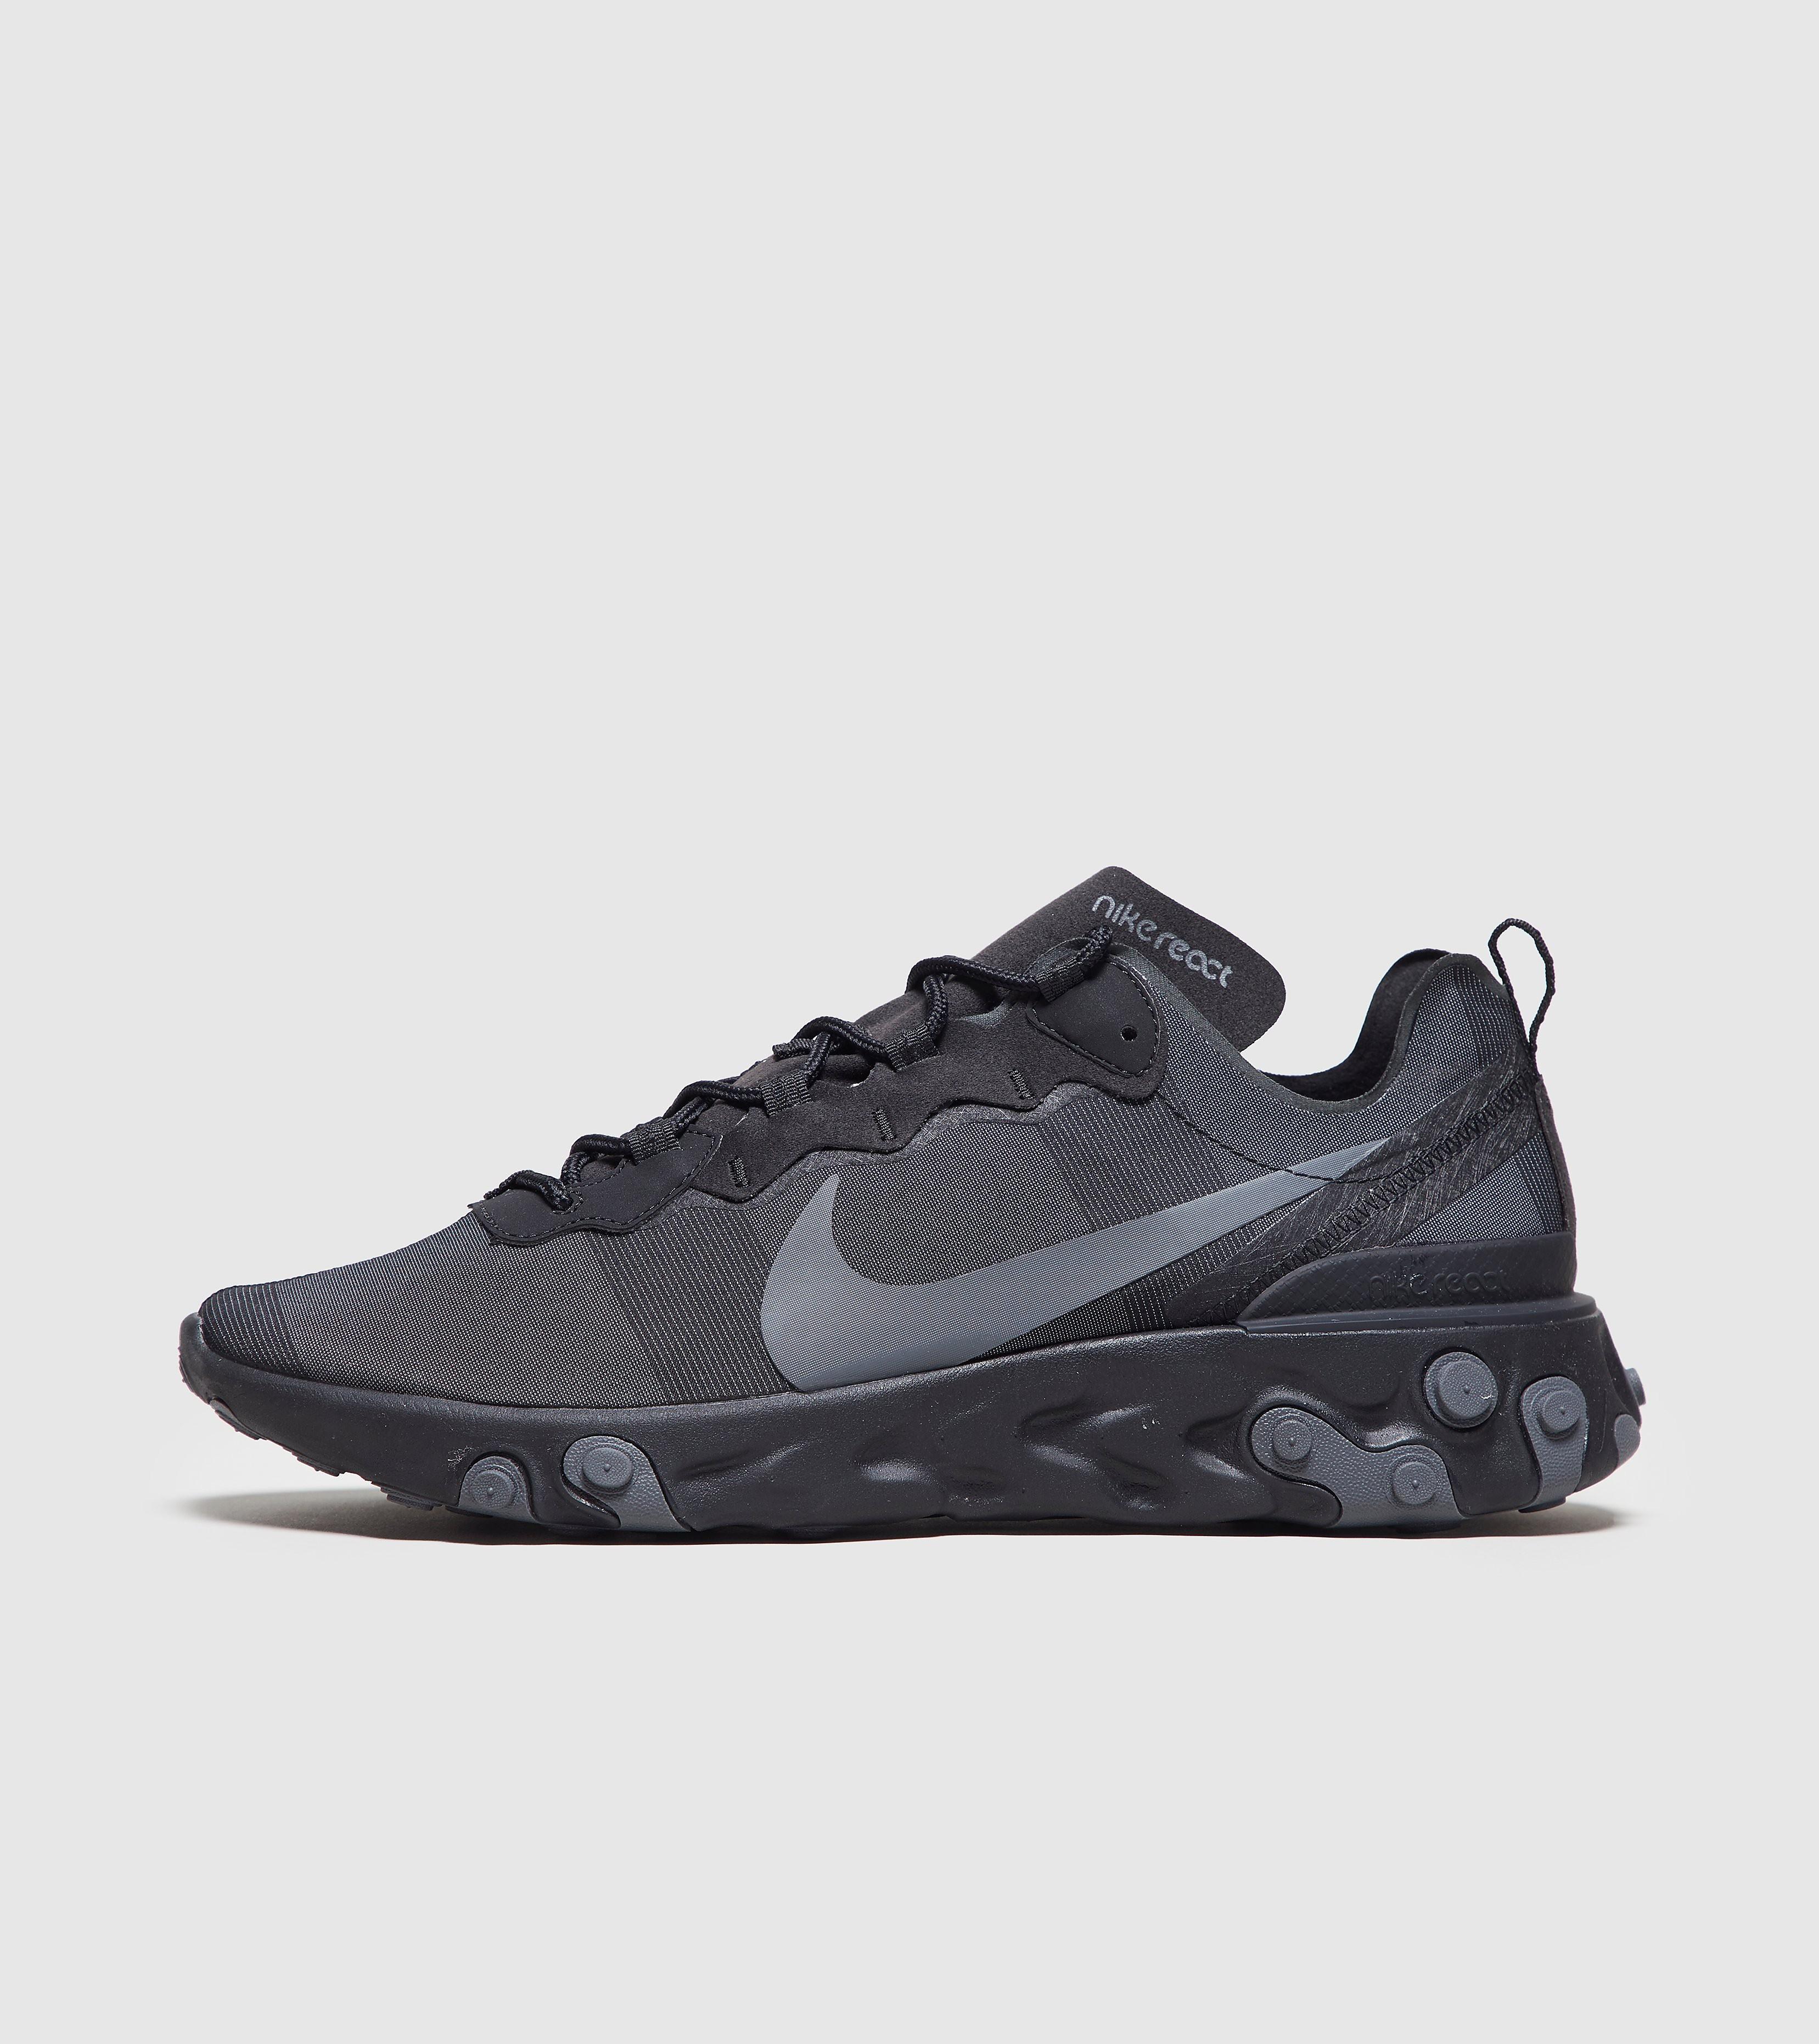 quality design 1417b 100f9 Nike - London Trend